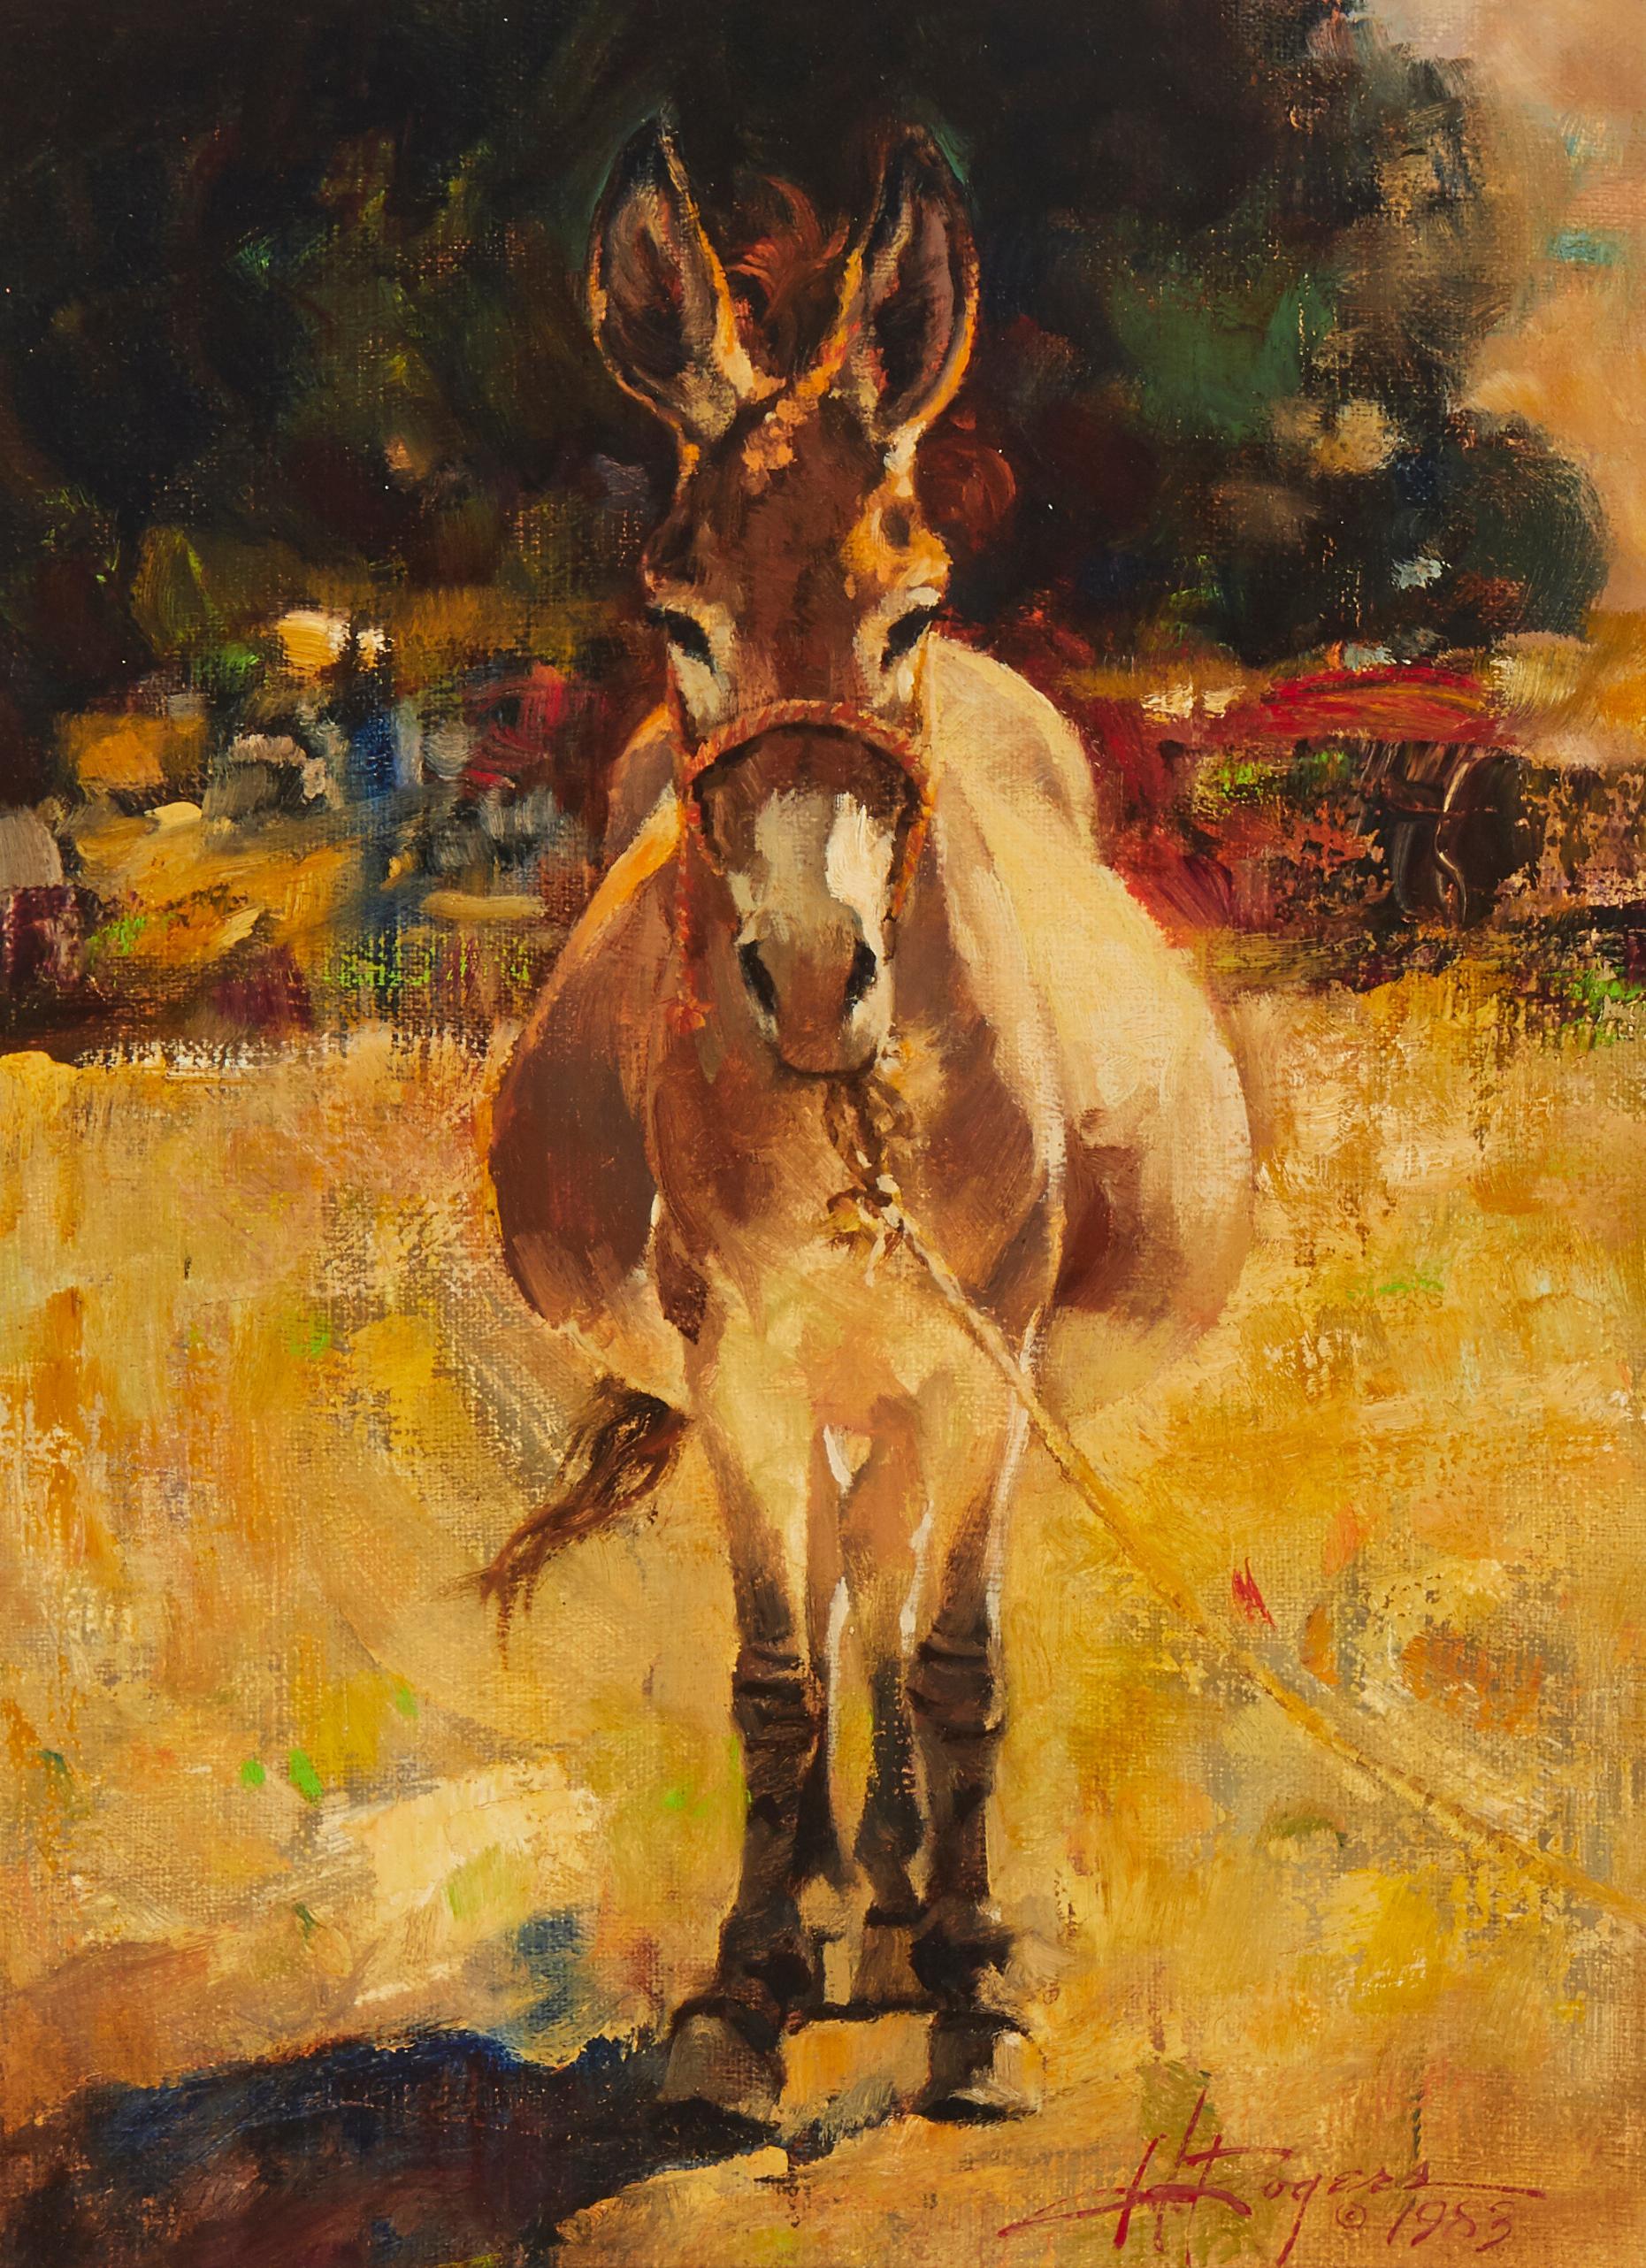 "Howard Rogers, (b.1932, Cave Creek, AZ), Portrait of a Donkey, 1983, Oil on canvas, 12"" H x 9"" W"